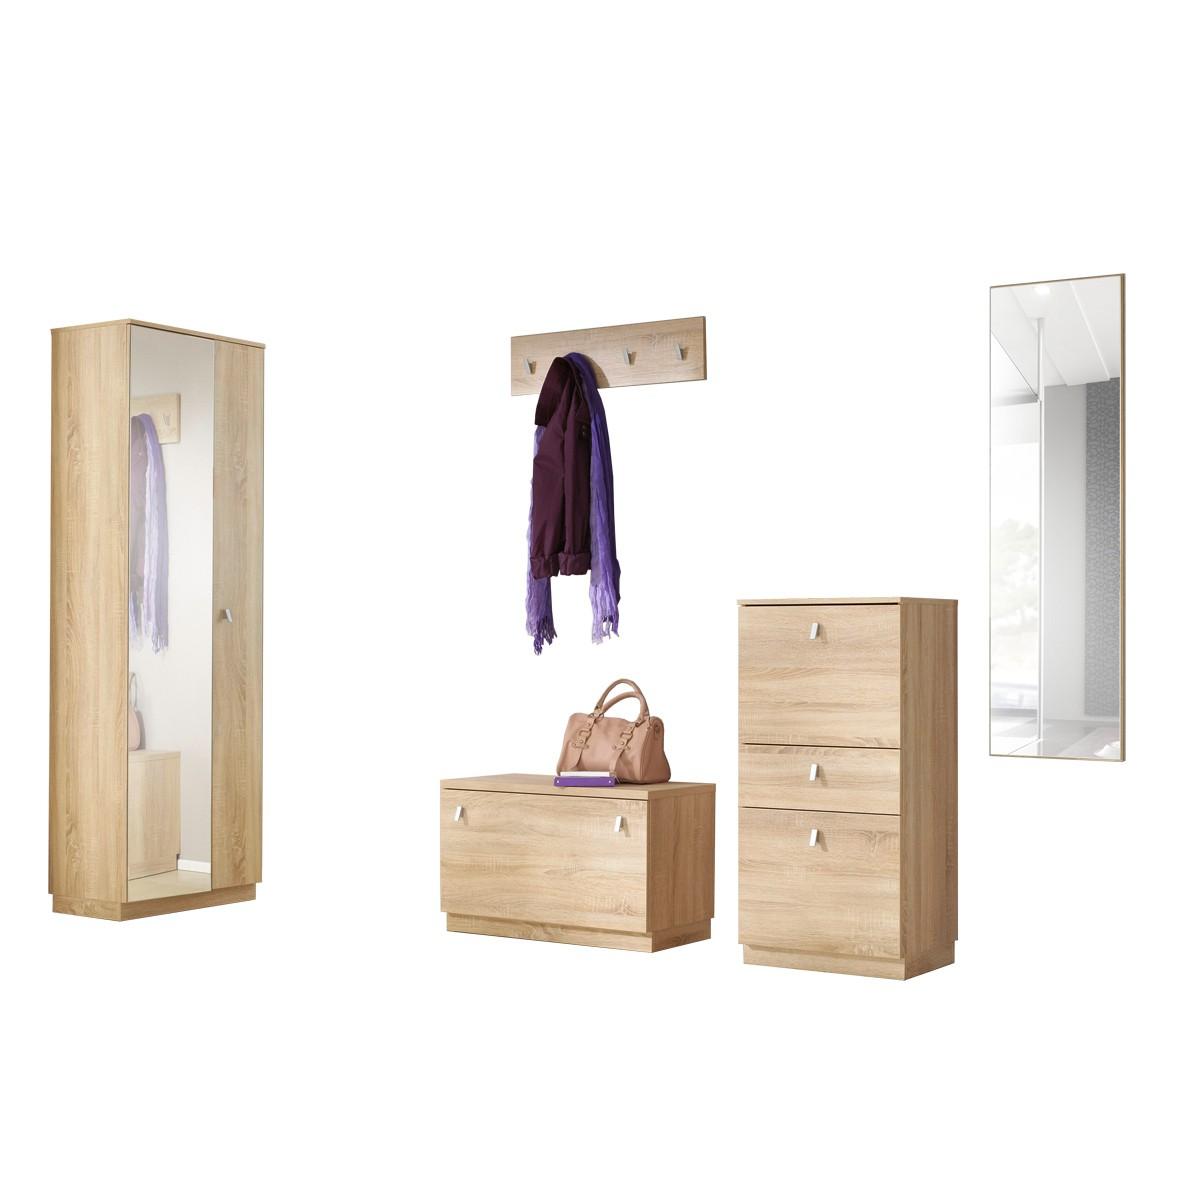 garderobe gornluend 5 teilig in eiche saegerau. Black Bedroom Furniture Sets. Home Design Ideas